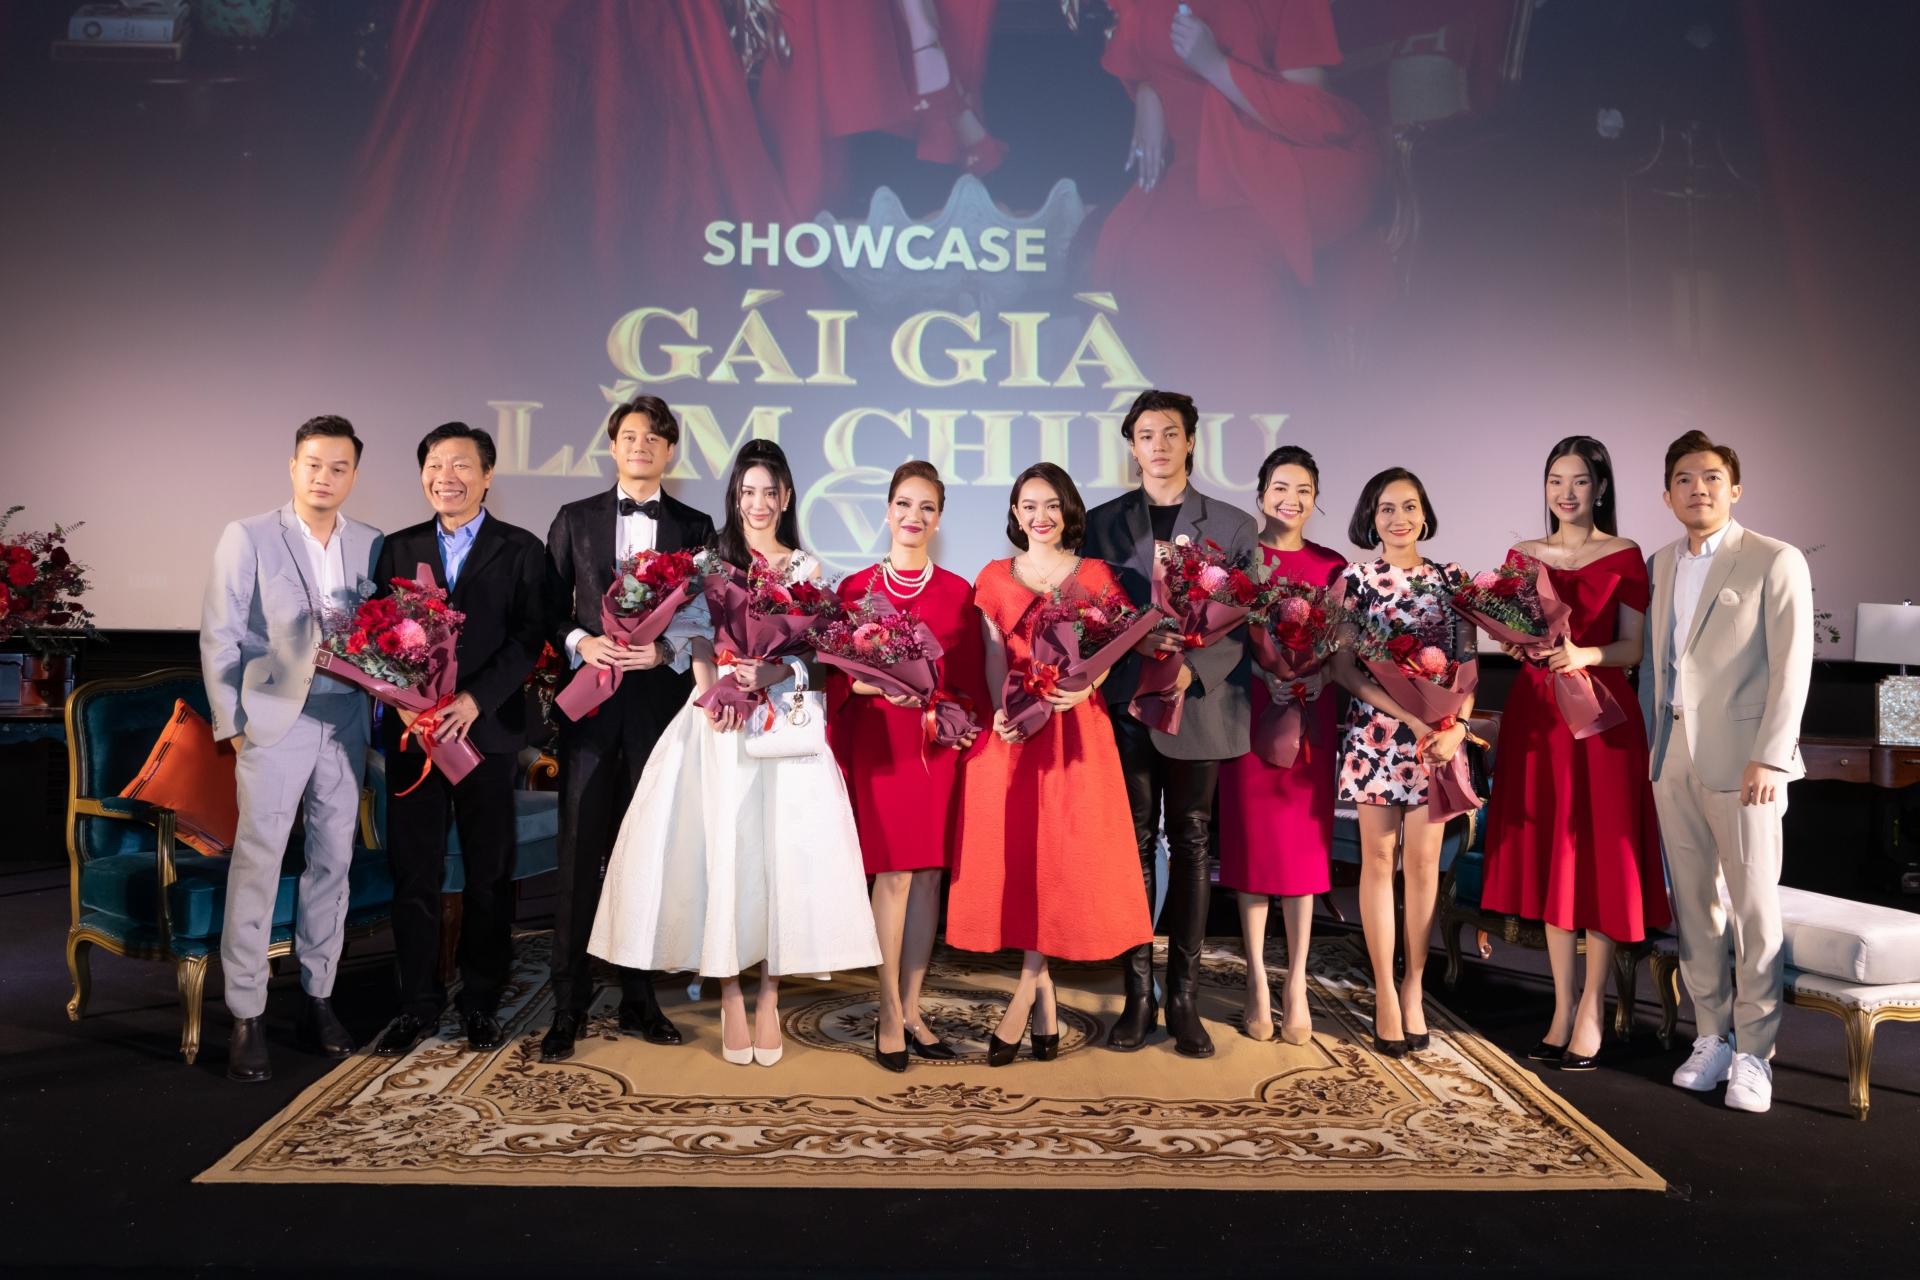 Gai Gia Lam Chieu part 5 promises to be a mega hit this Tet